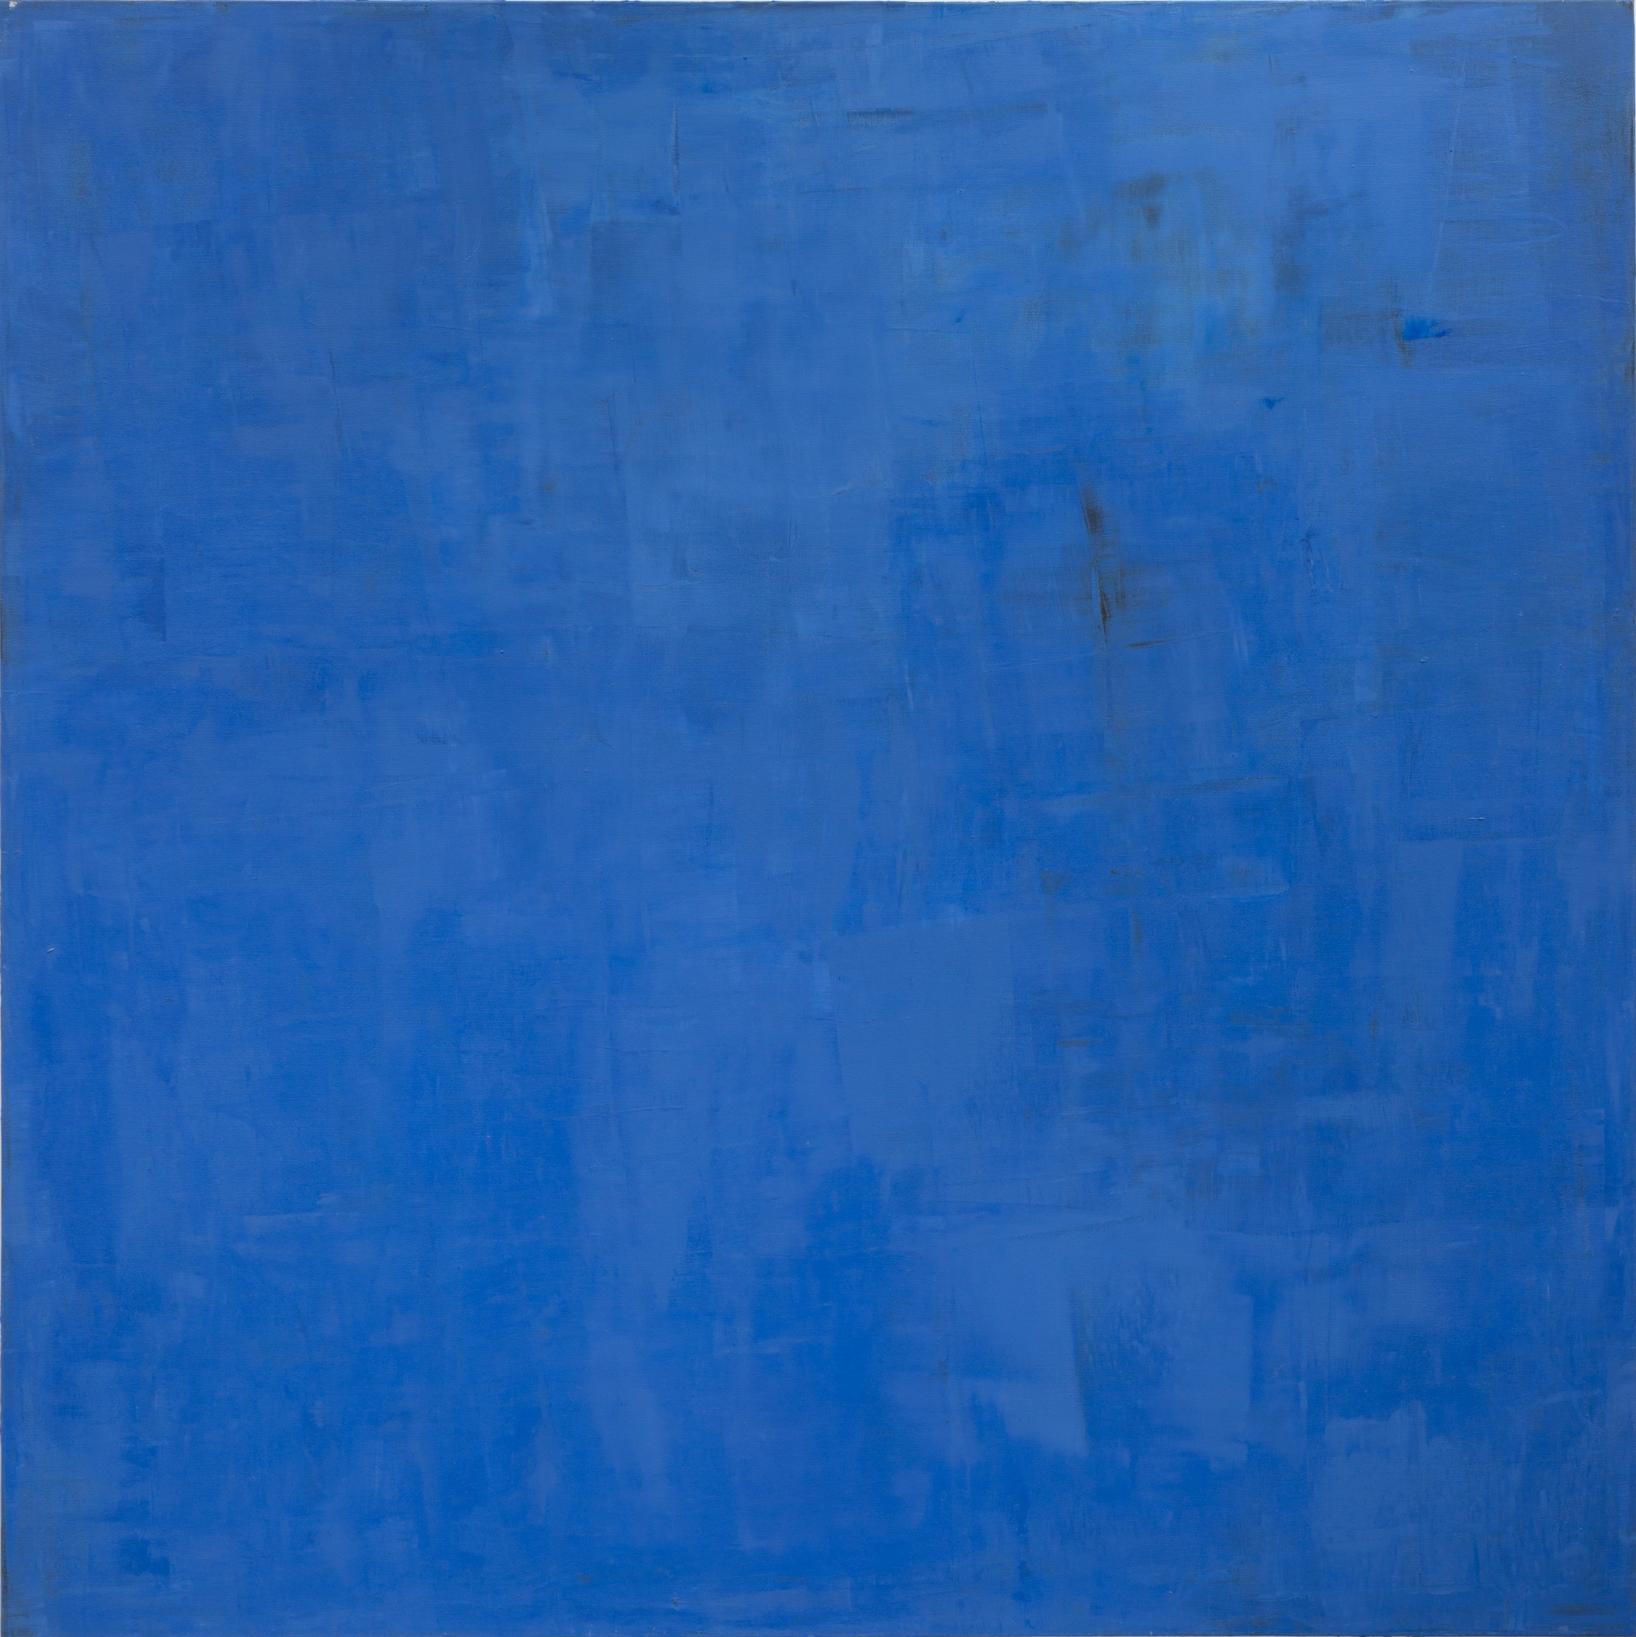 Untitled (blue #2)